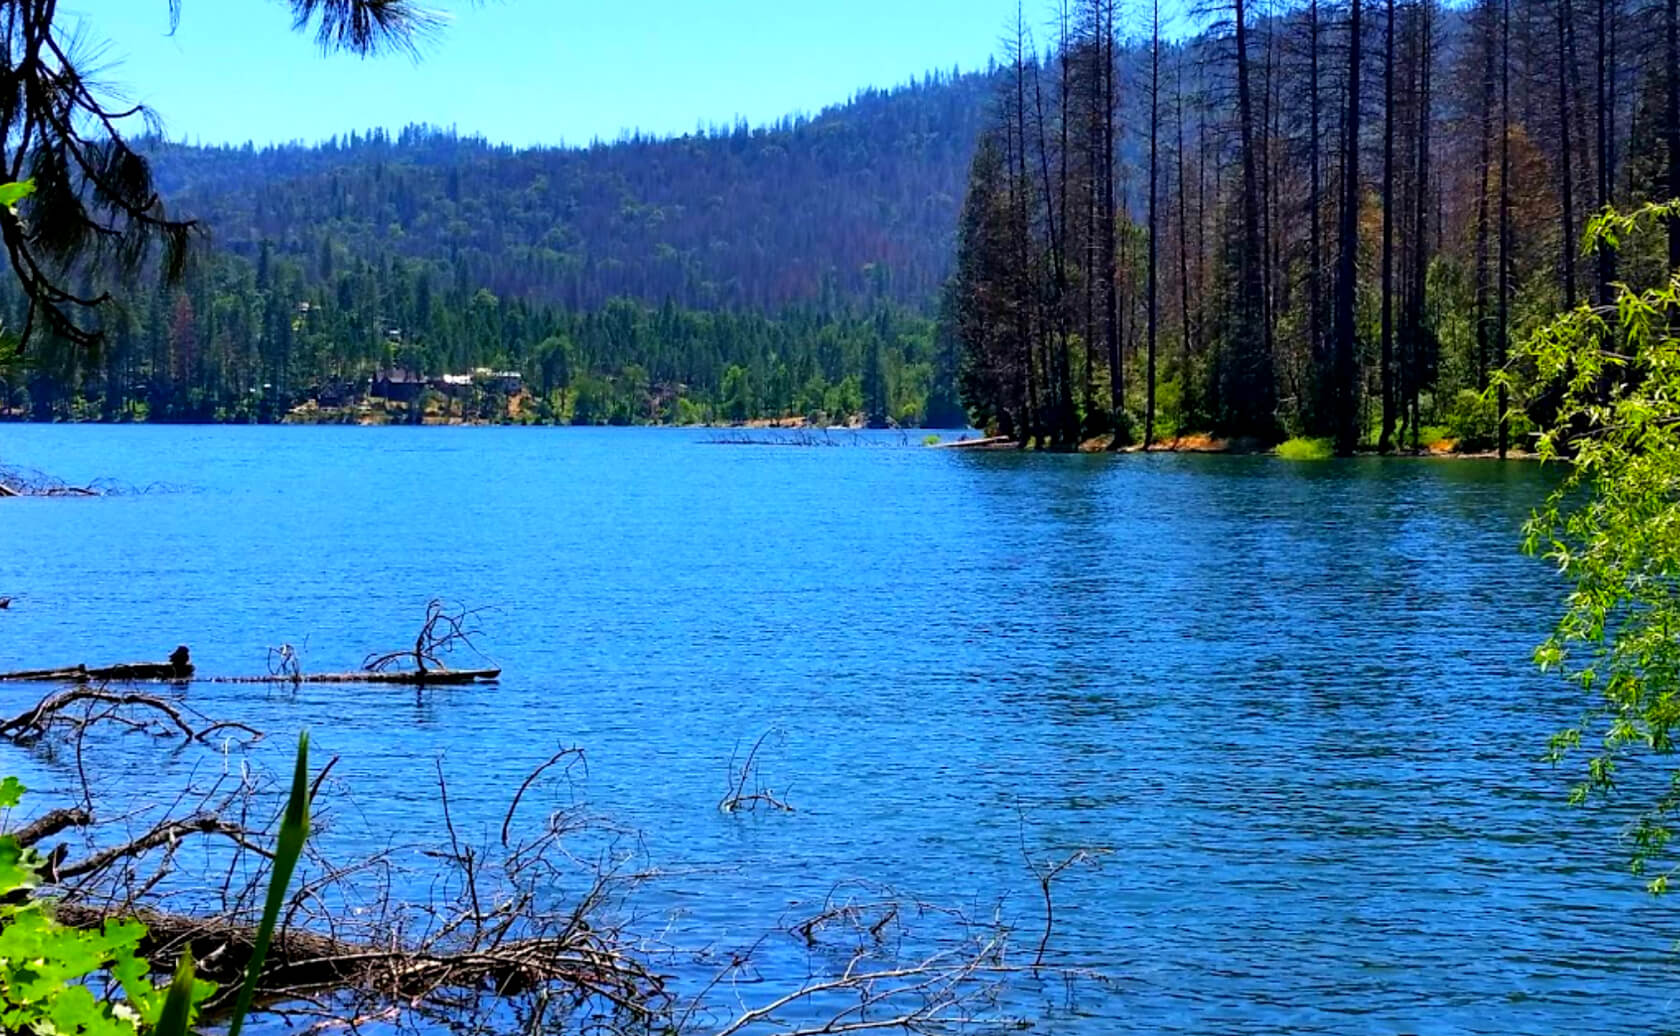 Bass-Lake-Reservoir-Fishing-Guide-Report-California-04